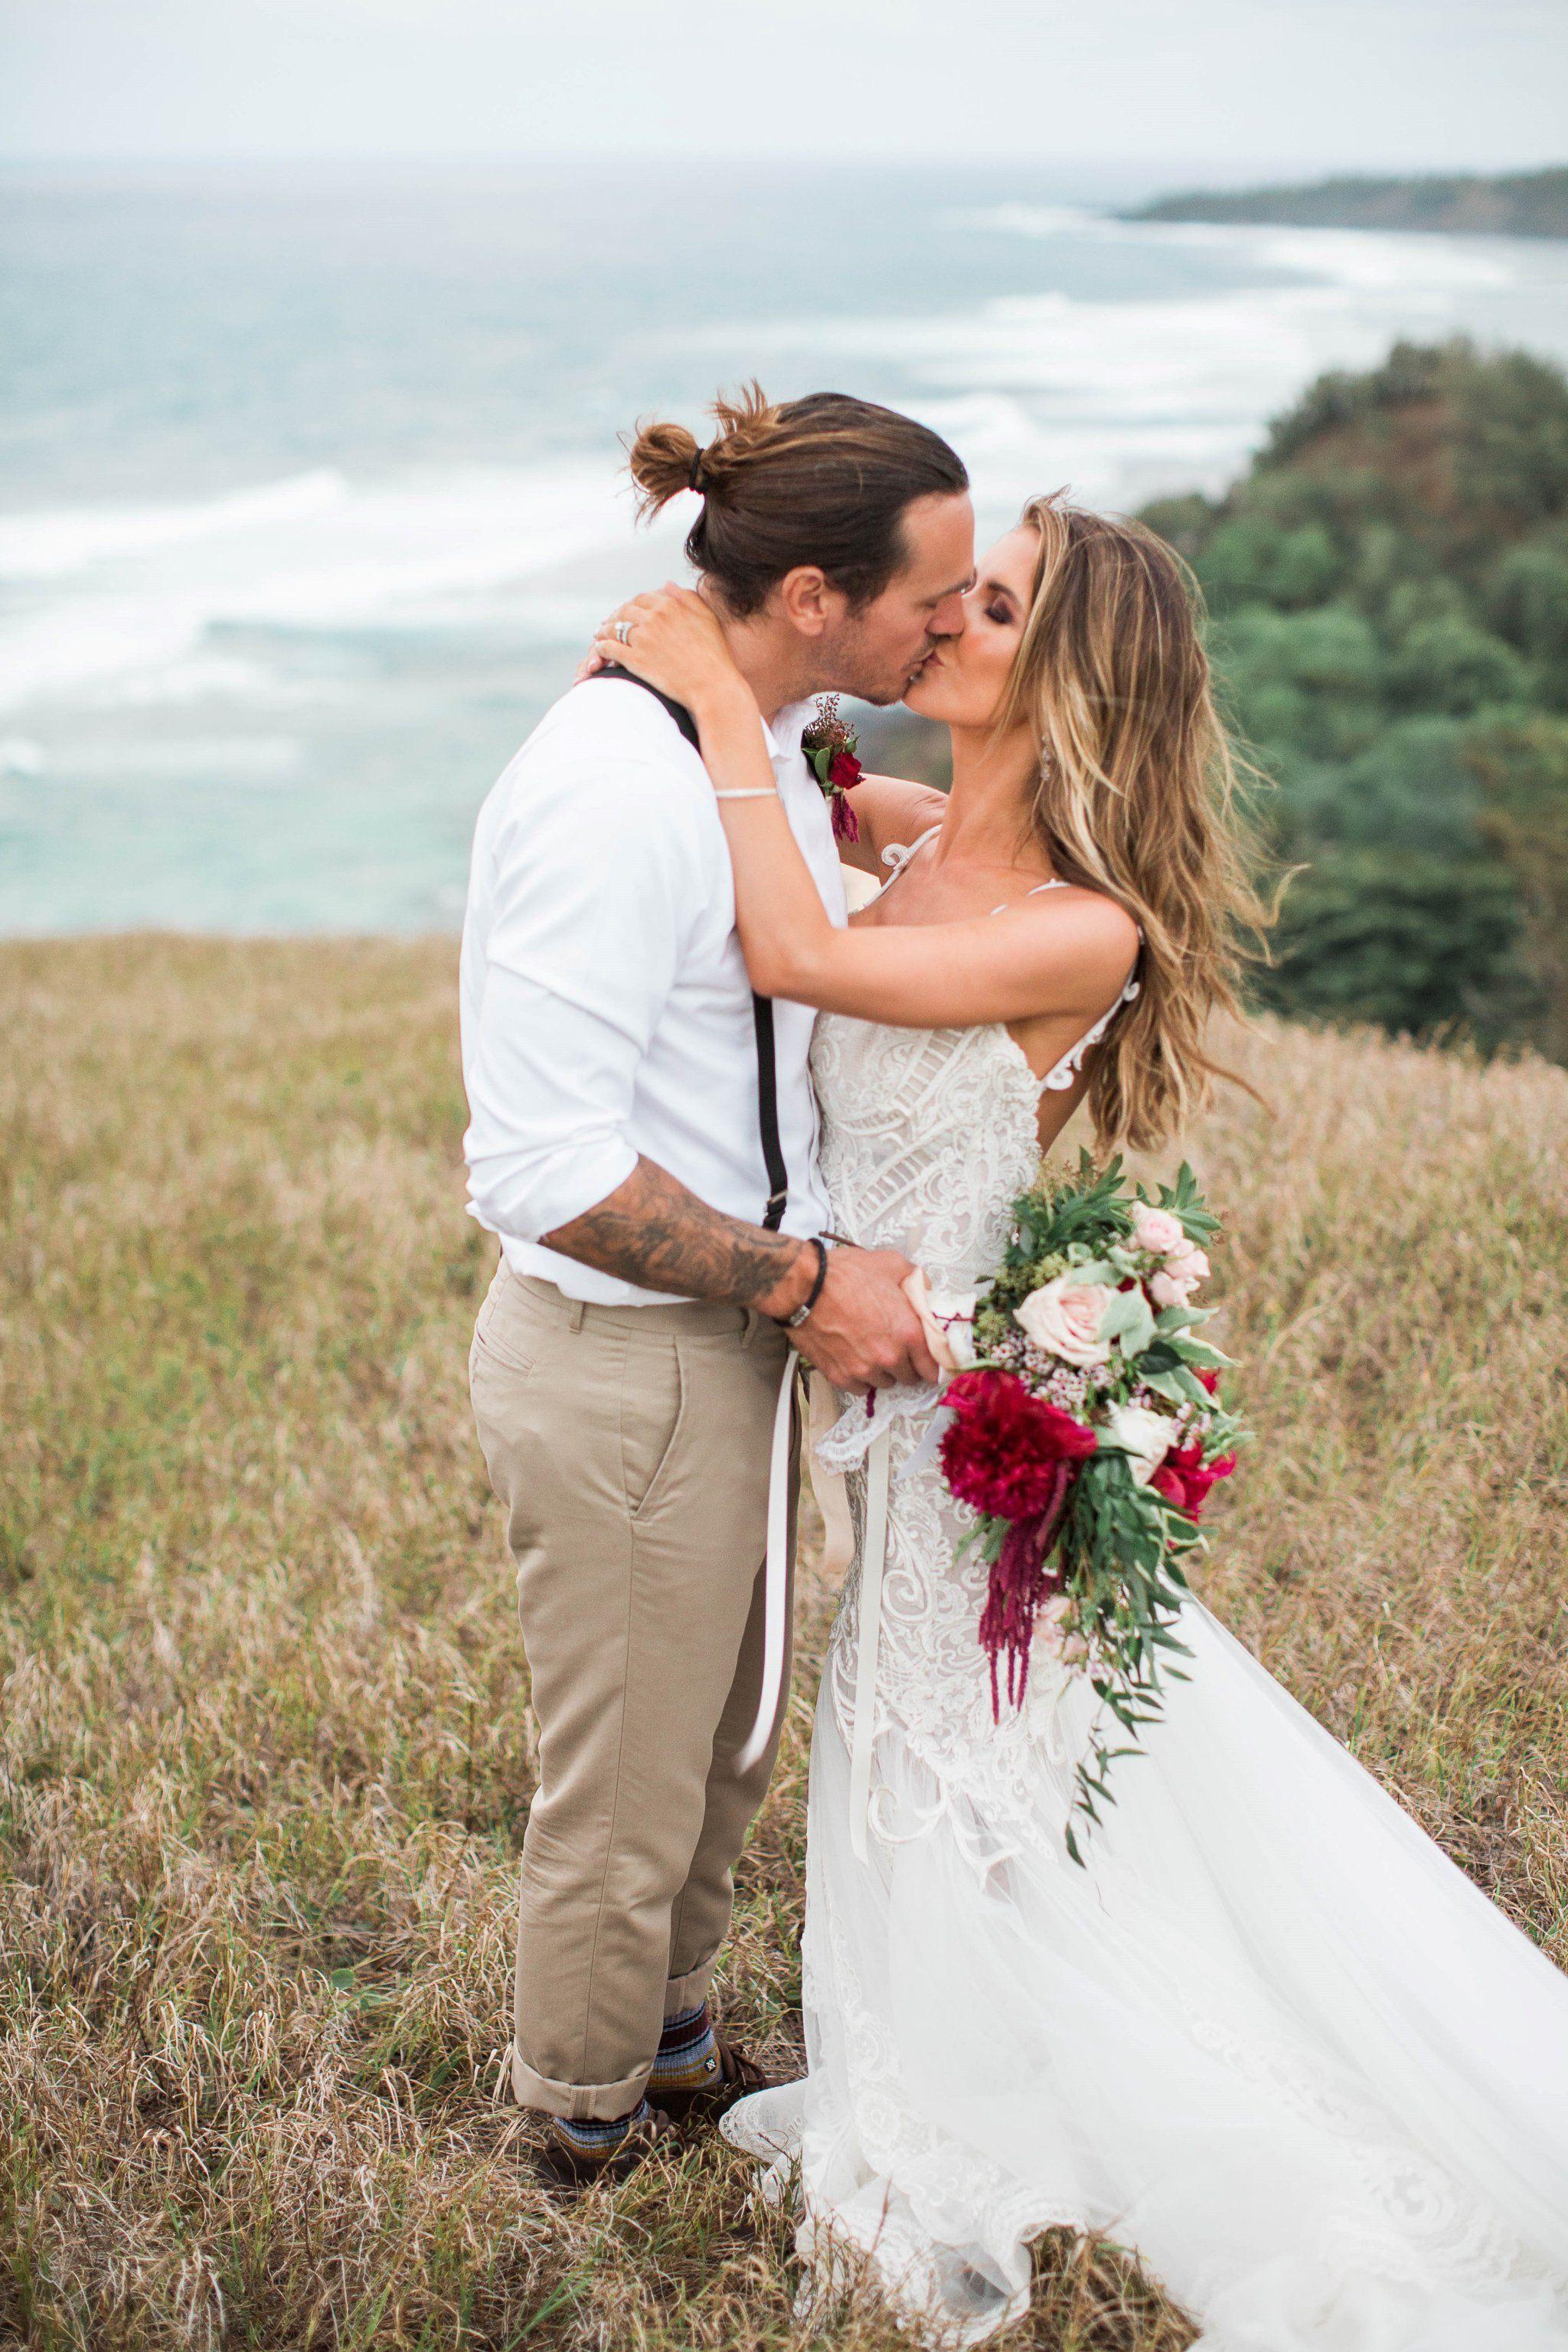 Photos From Audrina Patridge and Corey Bohan\'s Romantic Hawaiian Wedding